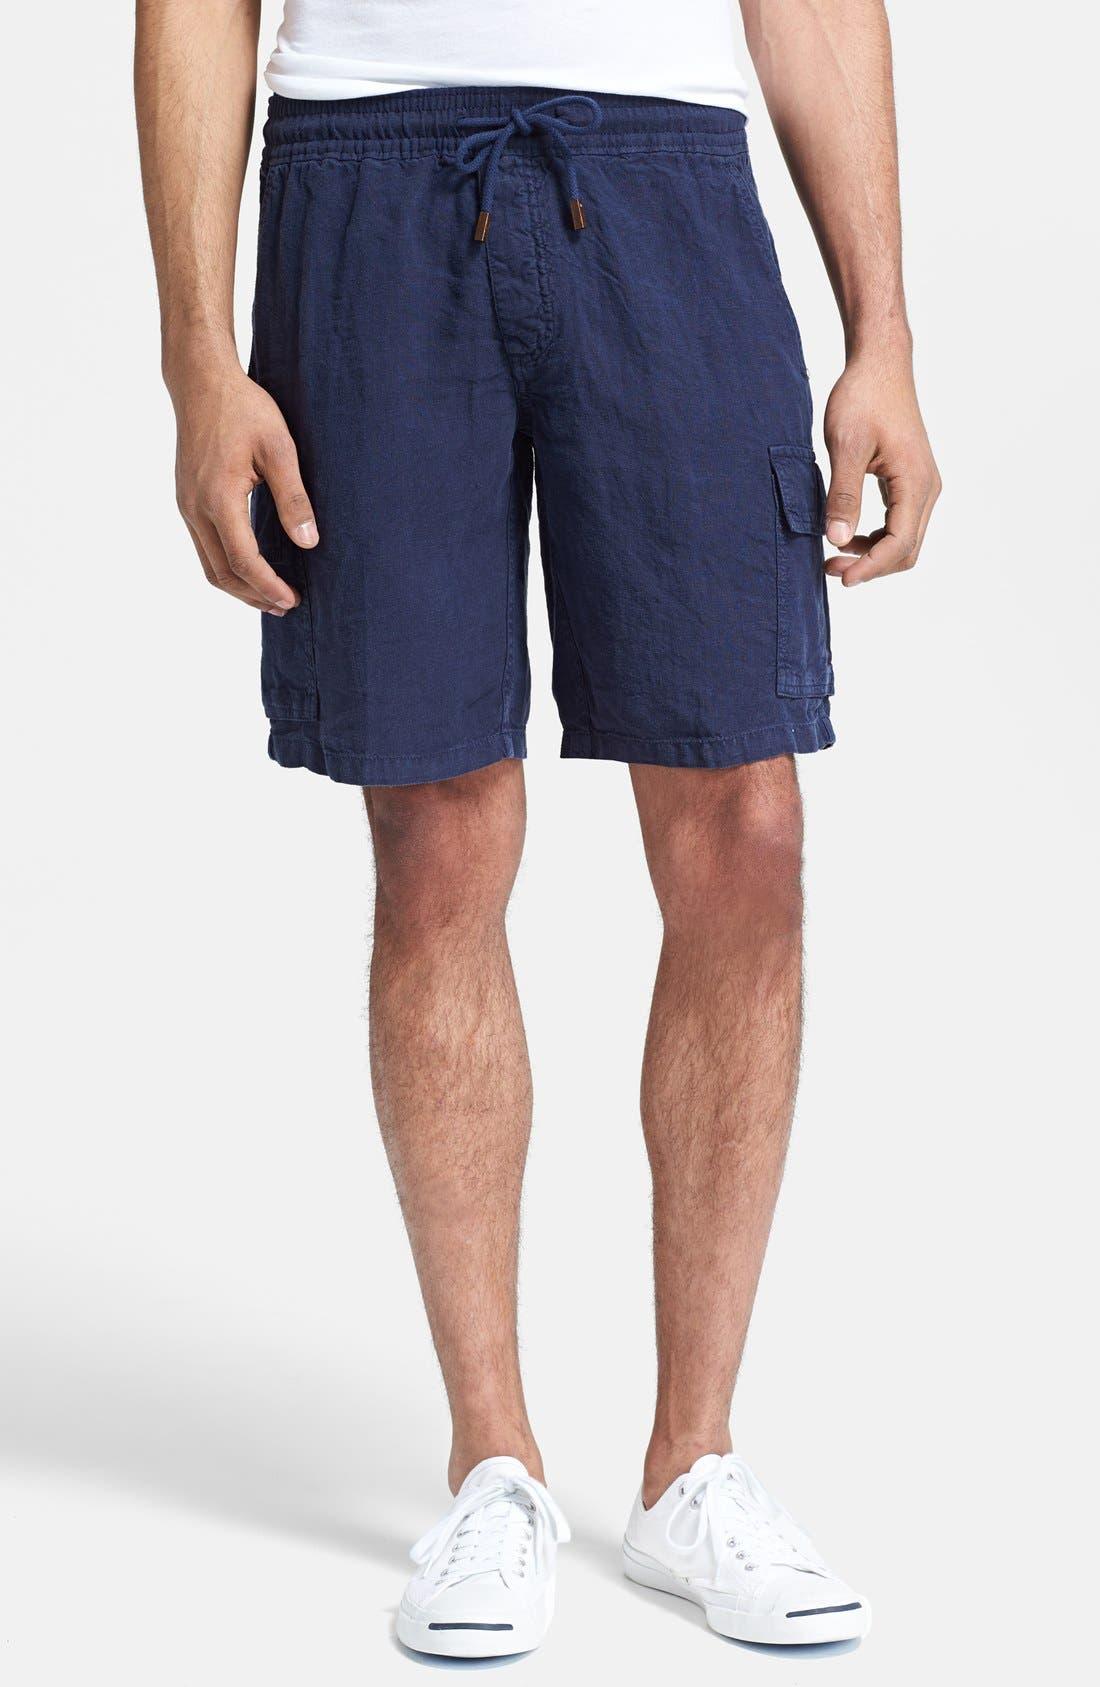 Main Image - Vilebrequin 'Baie' Linen Cargo Shorts